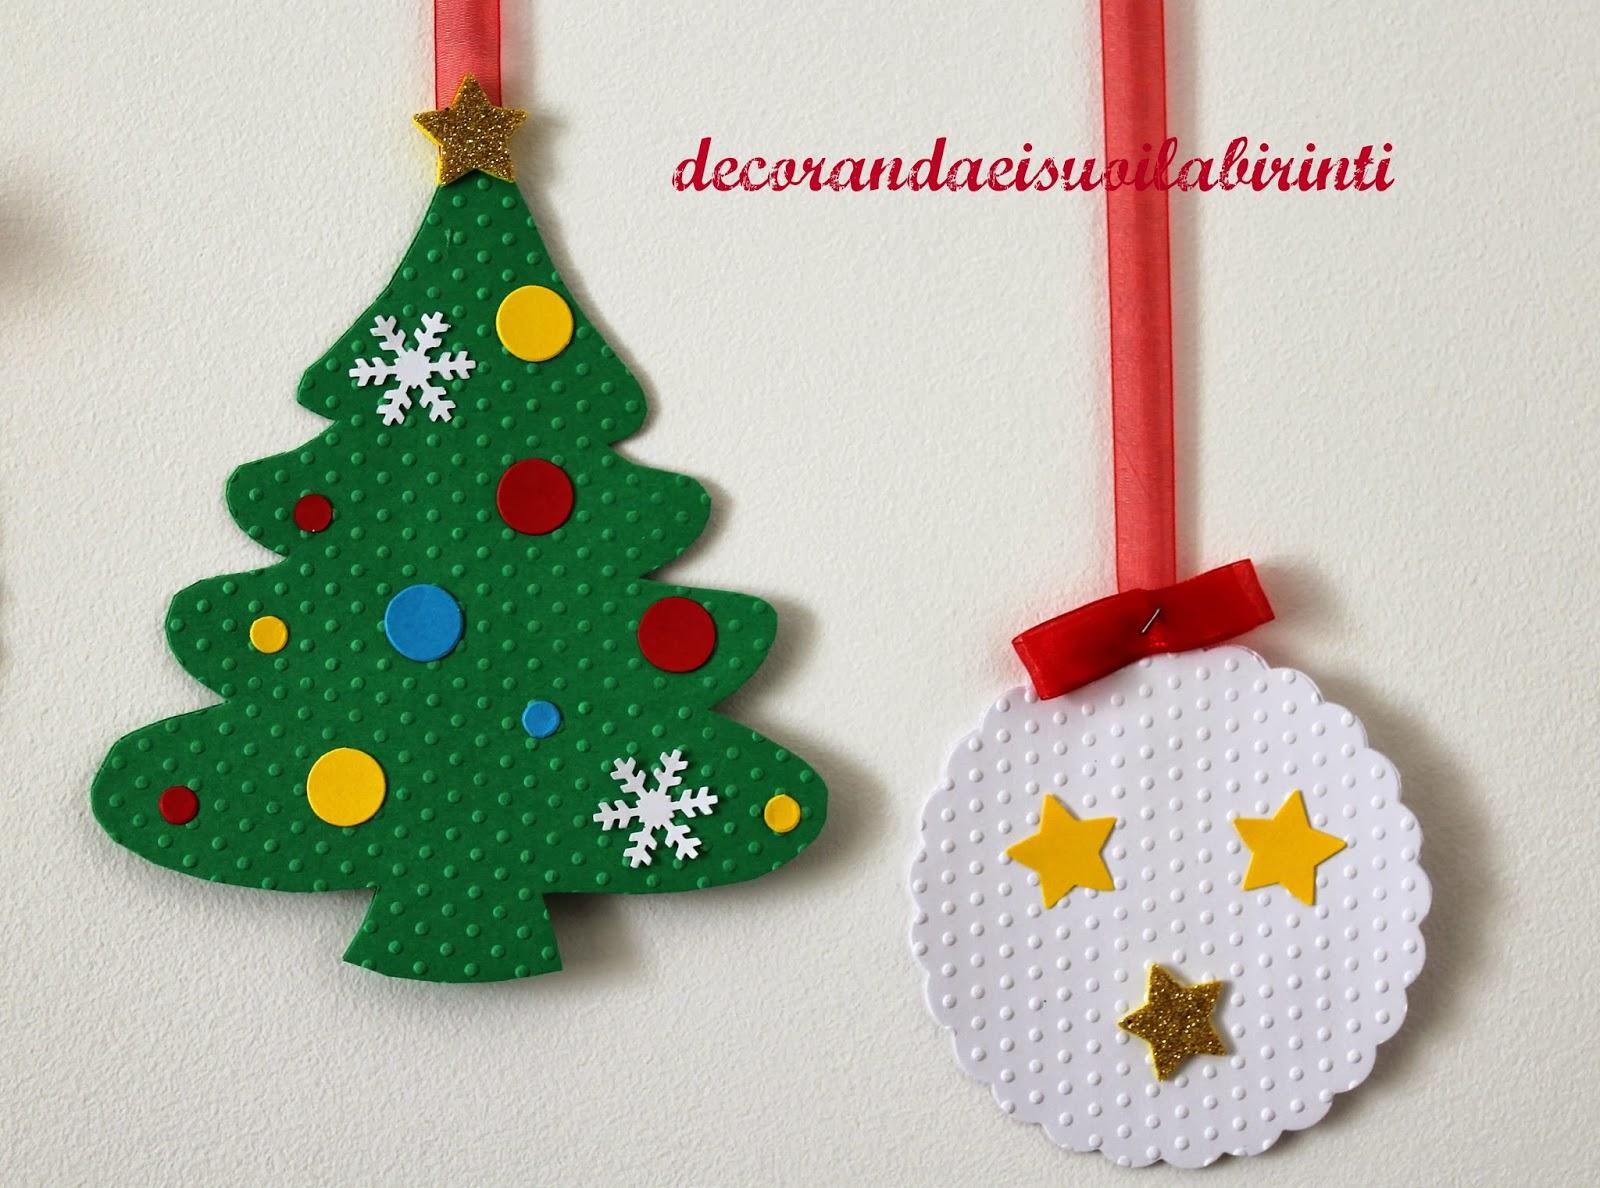 Decorandaeisuoilabirinti addobbi natalizi per aula for Addobbi natalizi scuola primaria